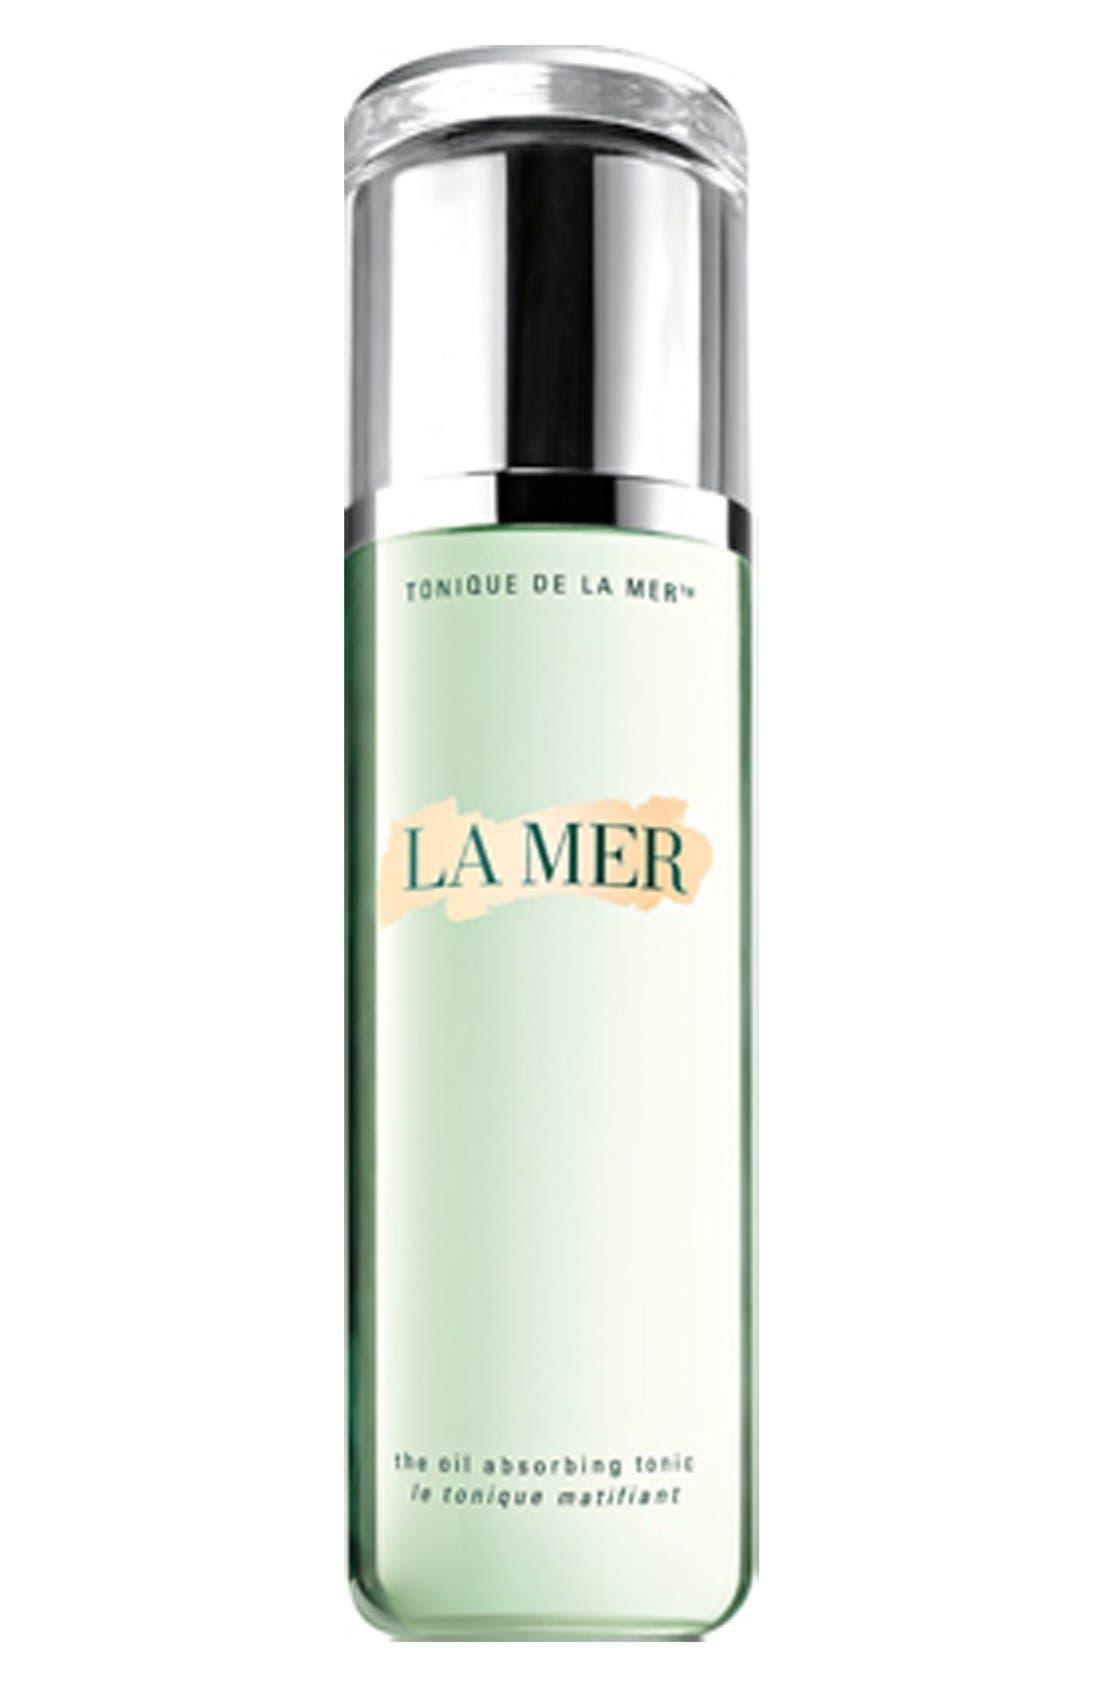 La Mer 'The Oil Absorbing Tonic'